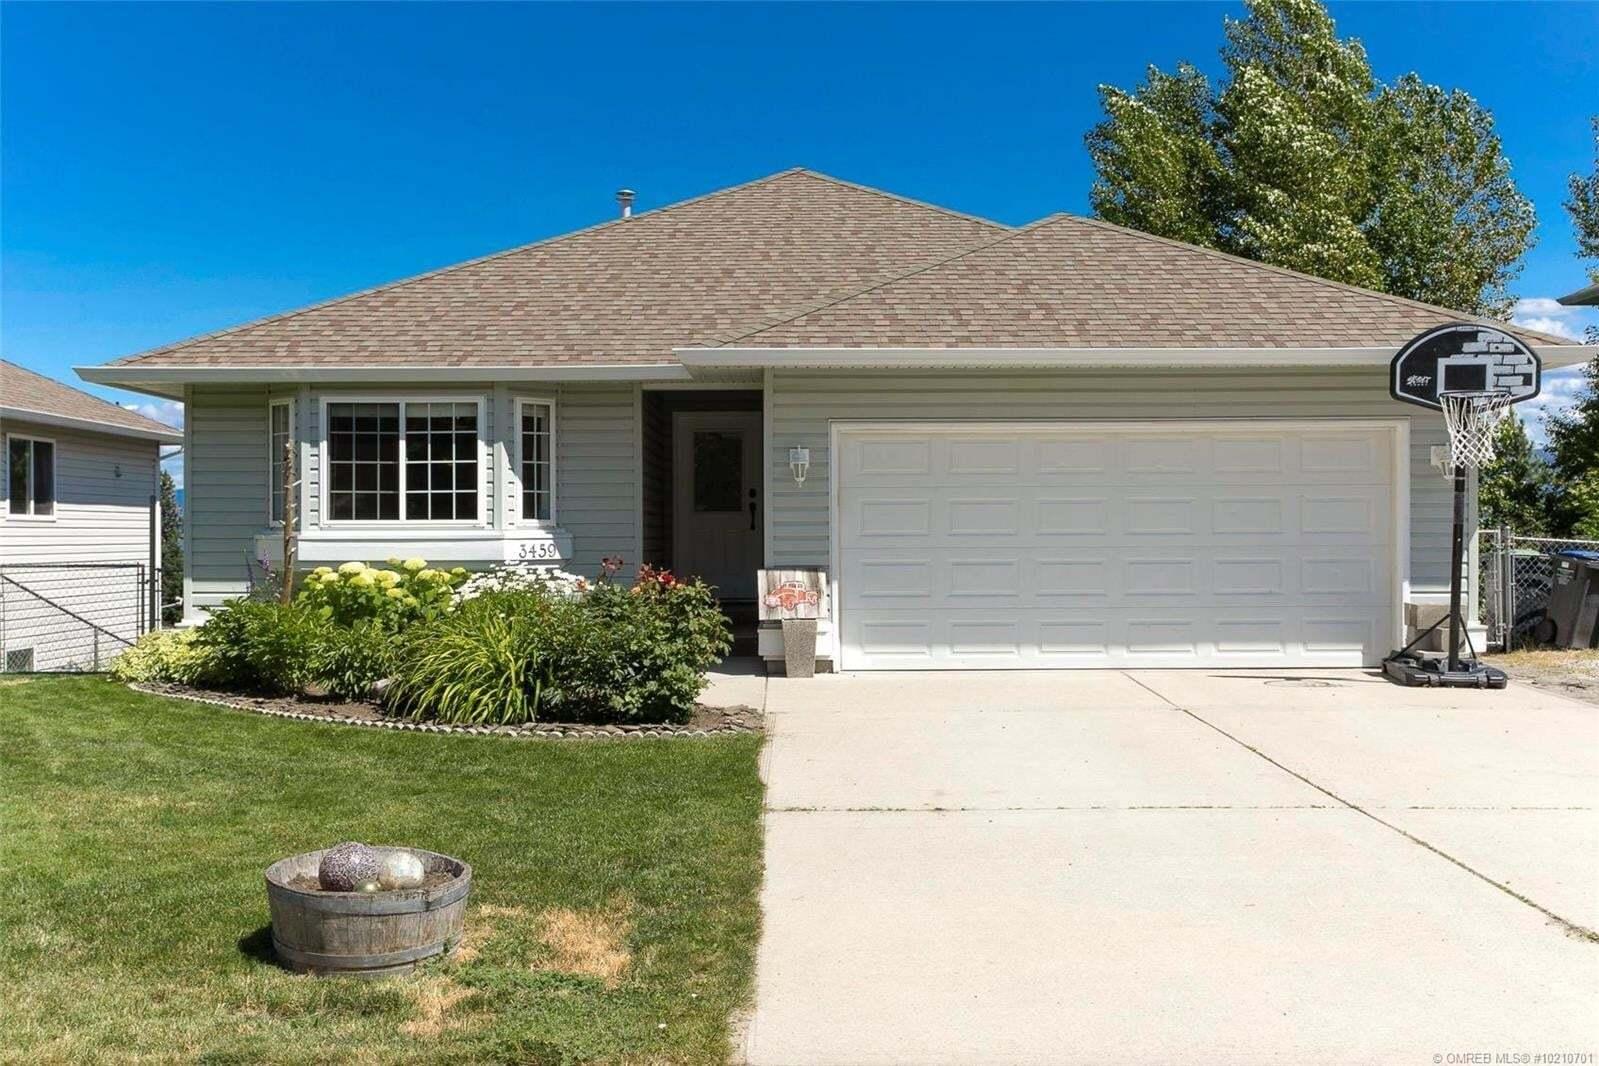 House for sale at 3459 Rosedale Ct West Kelowna British Columbia - MLS: 10210701